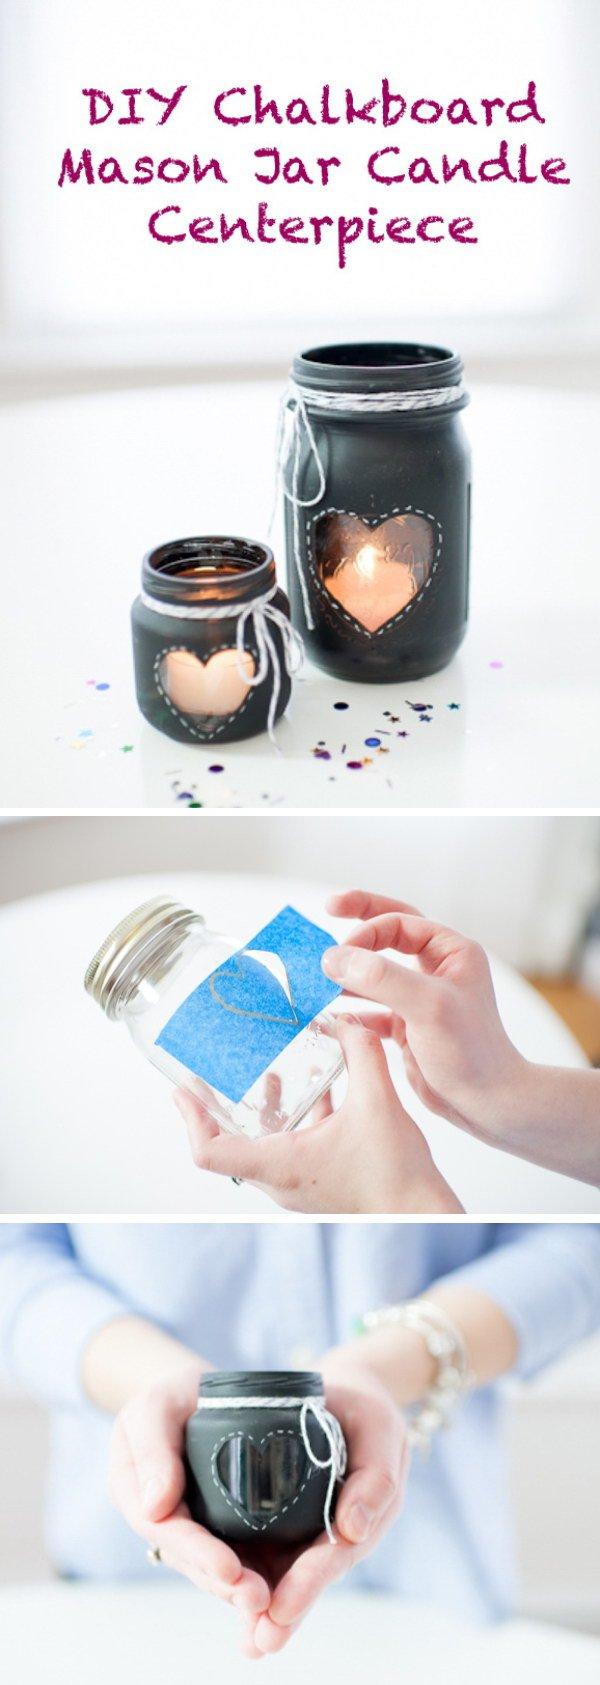 DIY Chalkboard Mason Jar Candle.